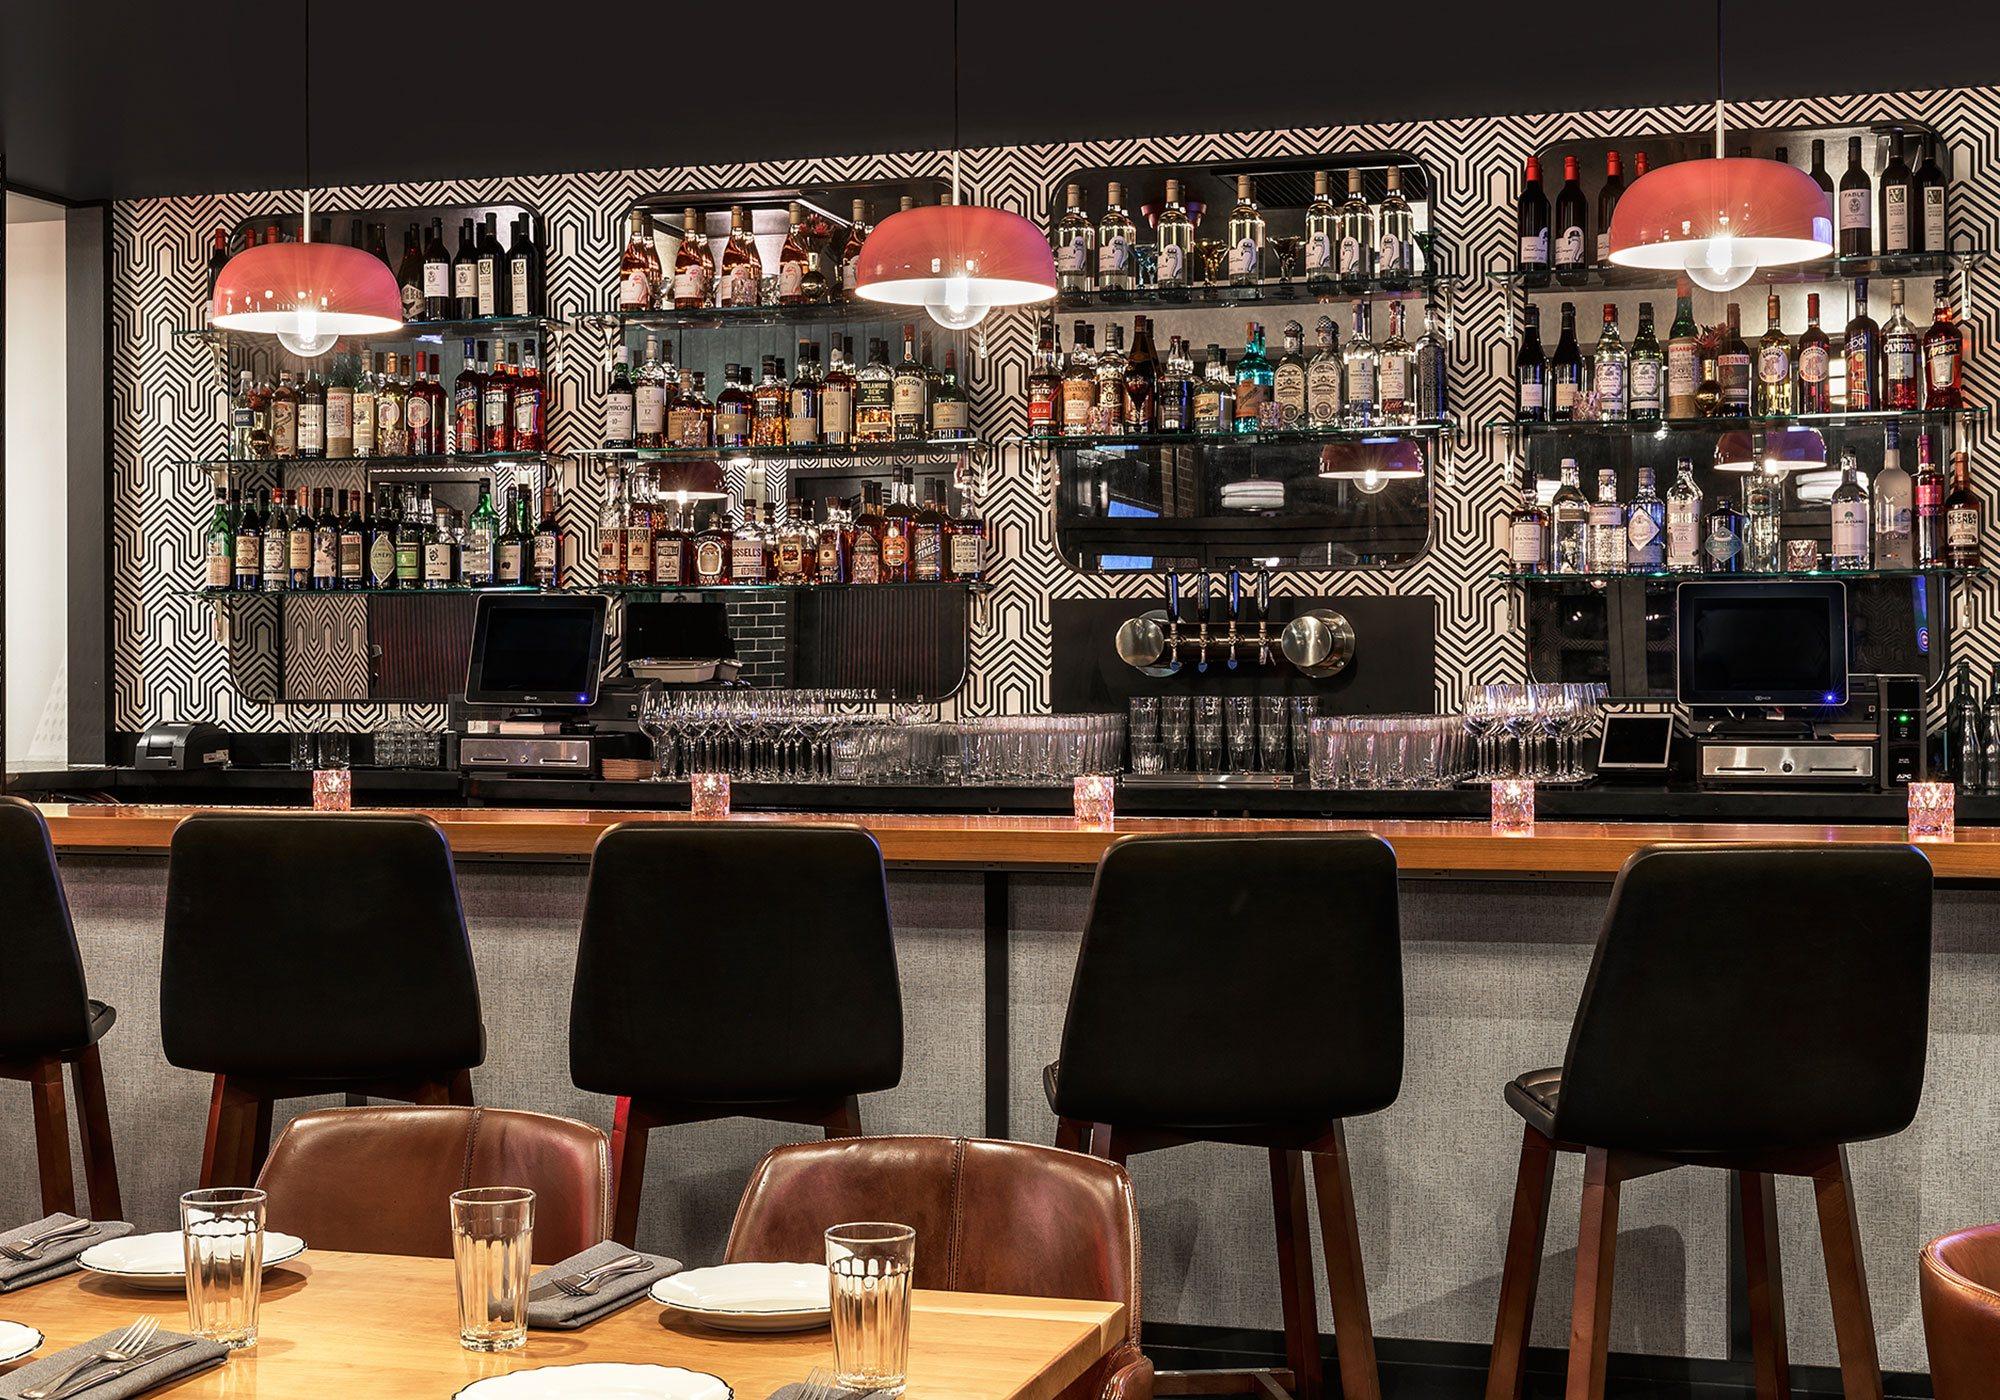 Detail of bar and barstools